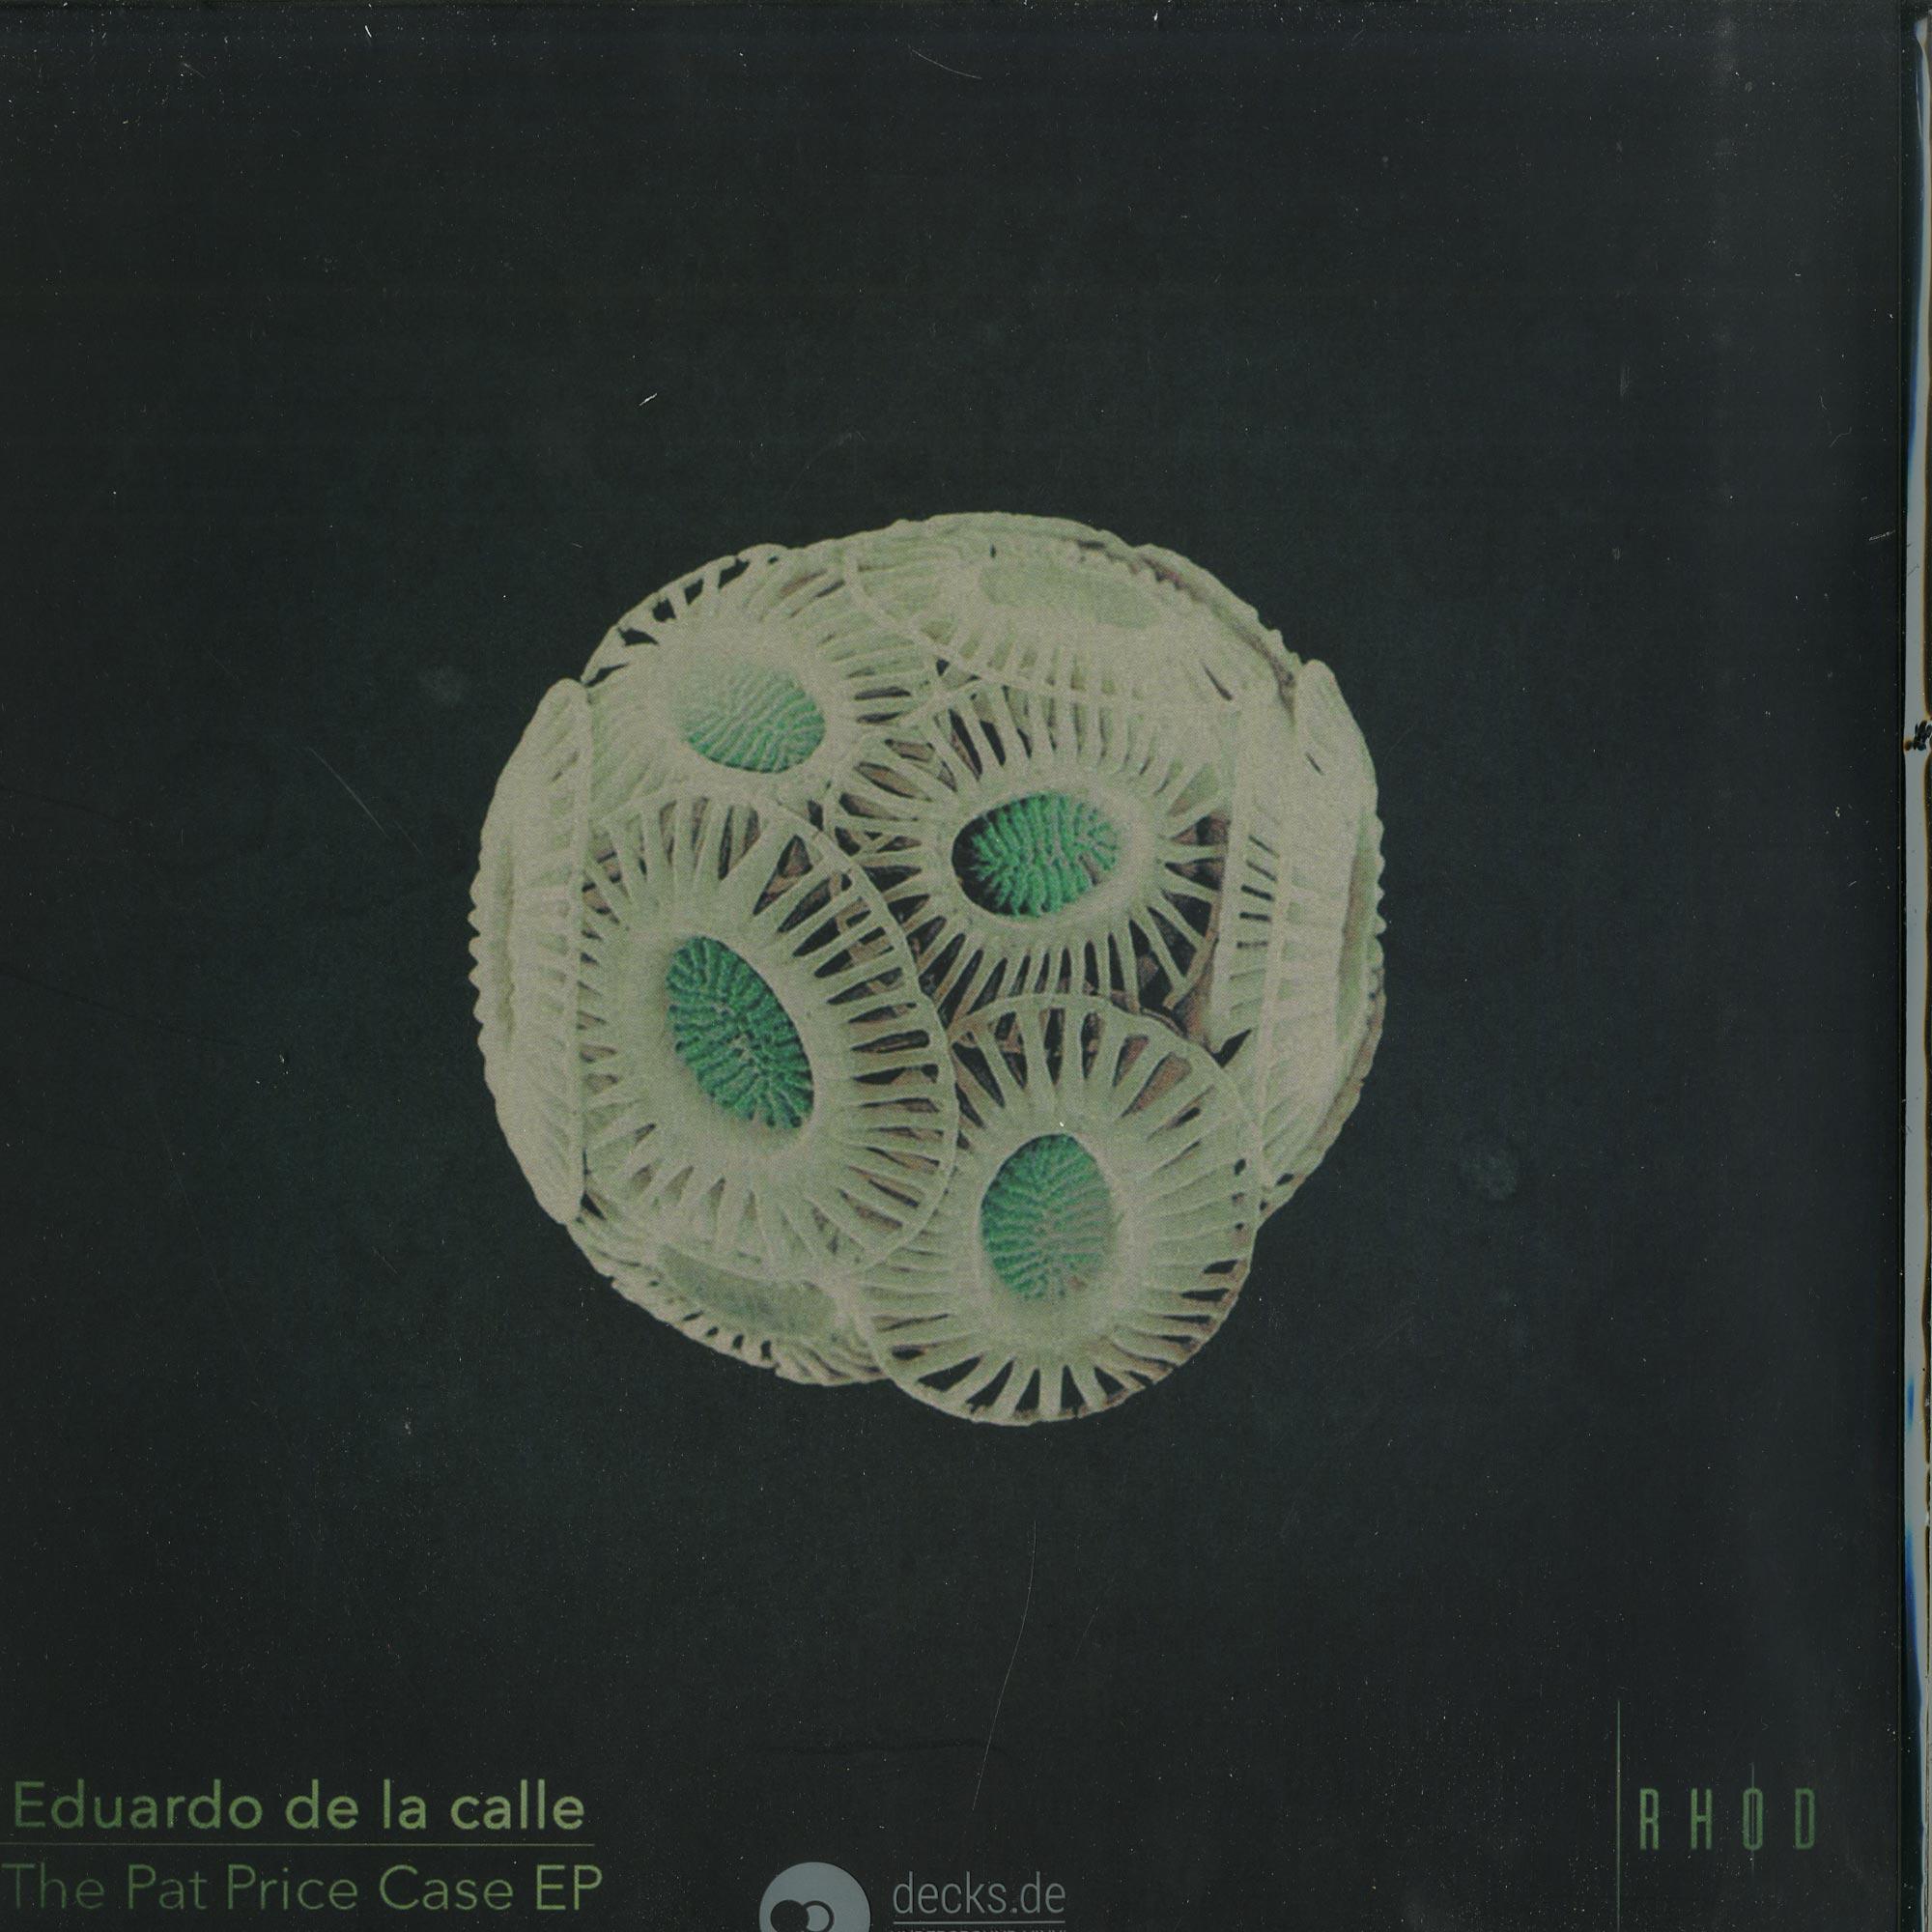 Eduardo De La Calle - THE PAT PRICE CASE EP